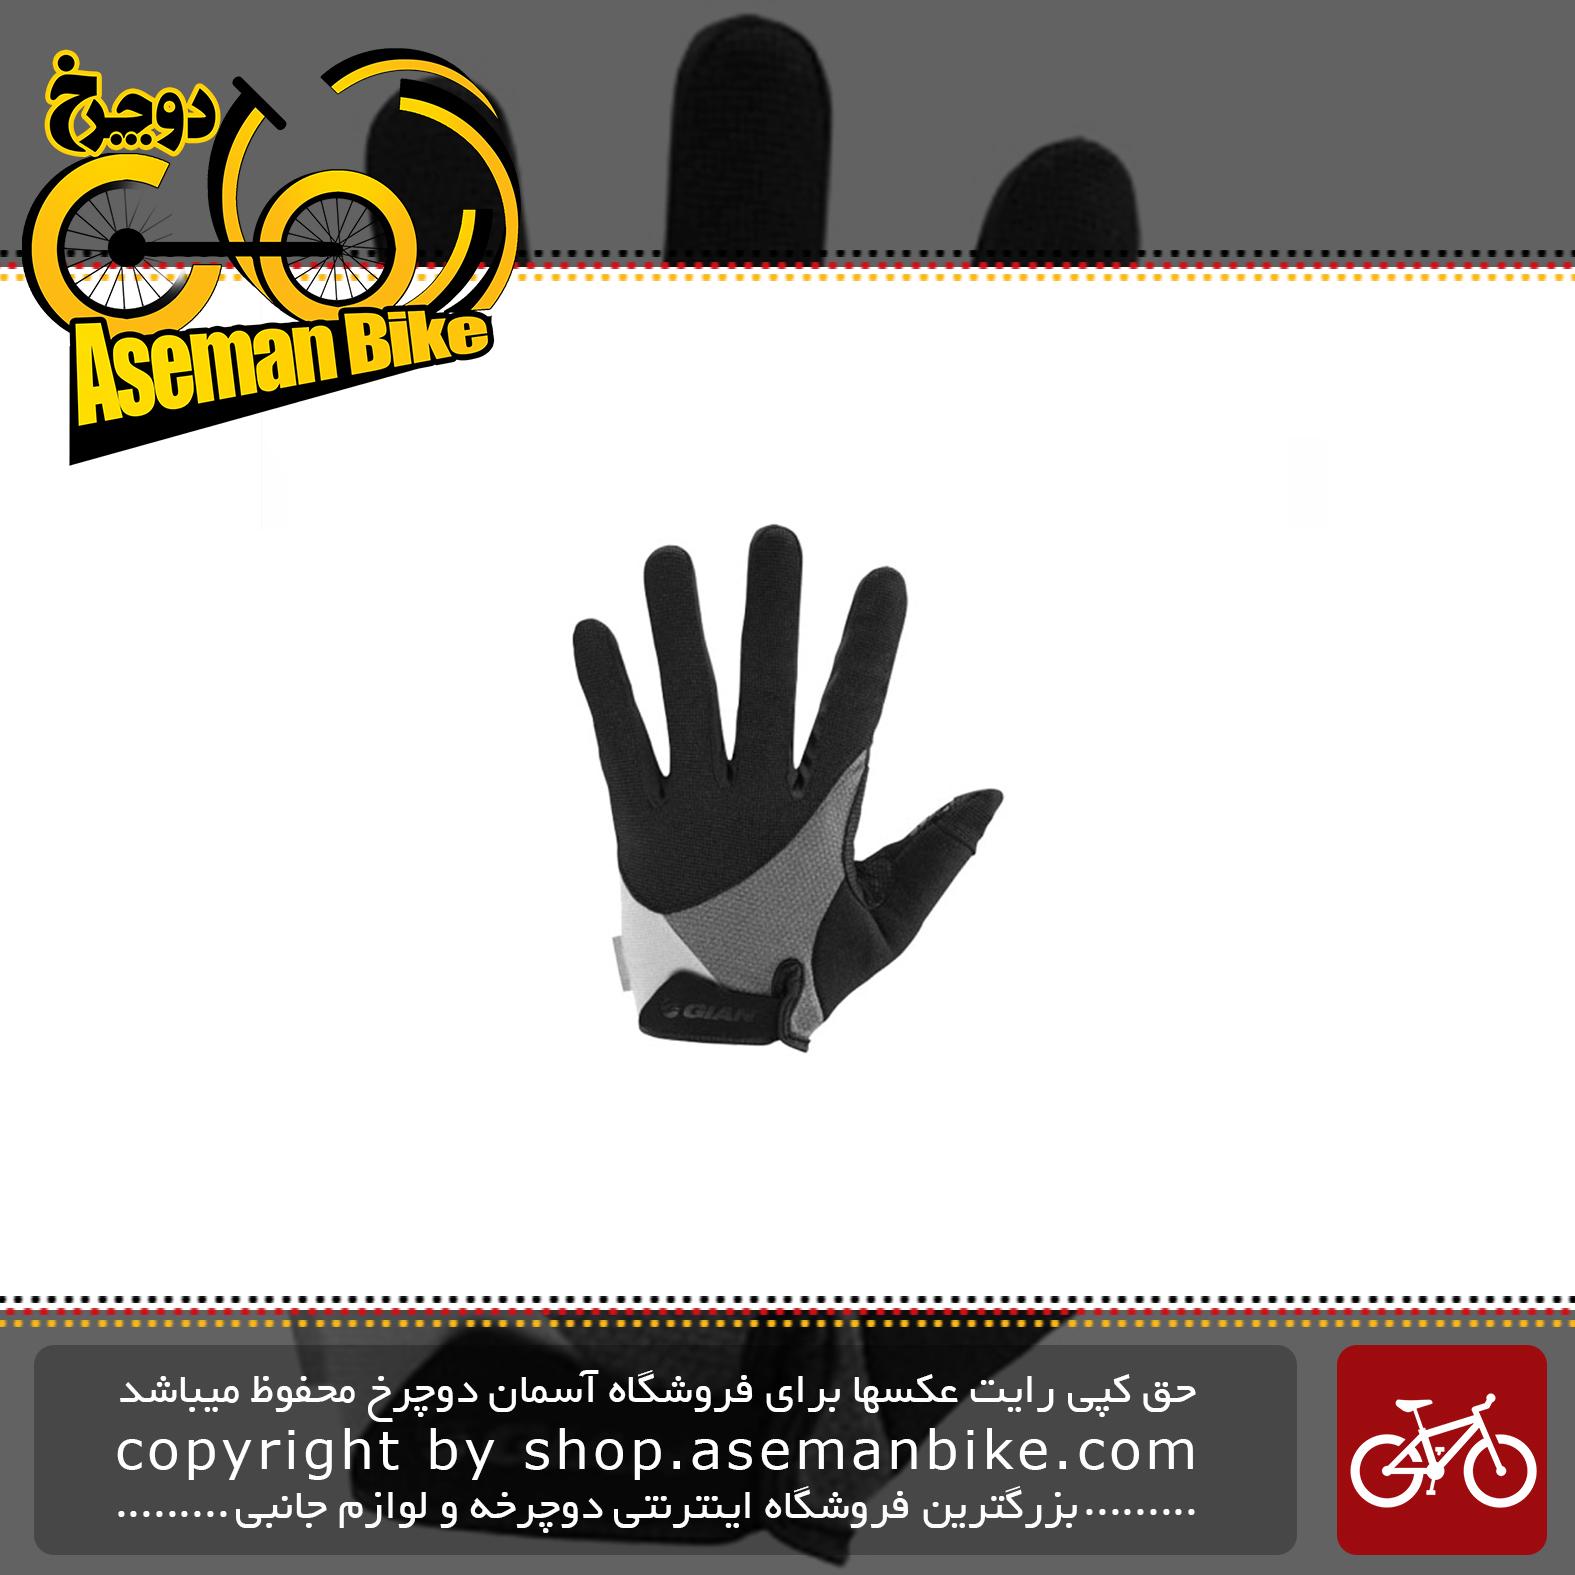 دستکش ژله ای جاینت مدل استریک گال گلو لانگ Giant Streak Gel Glove Long